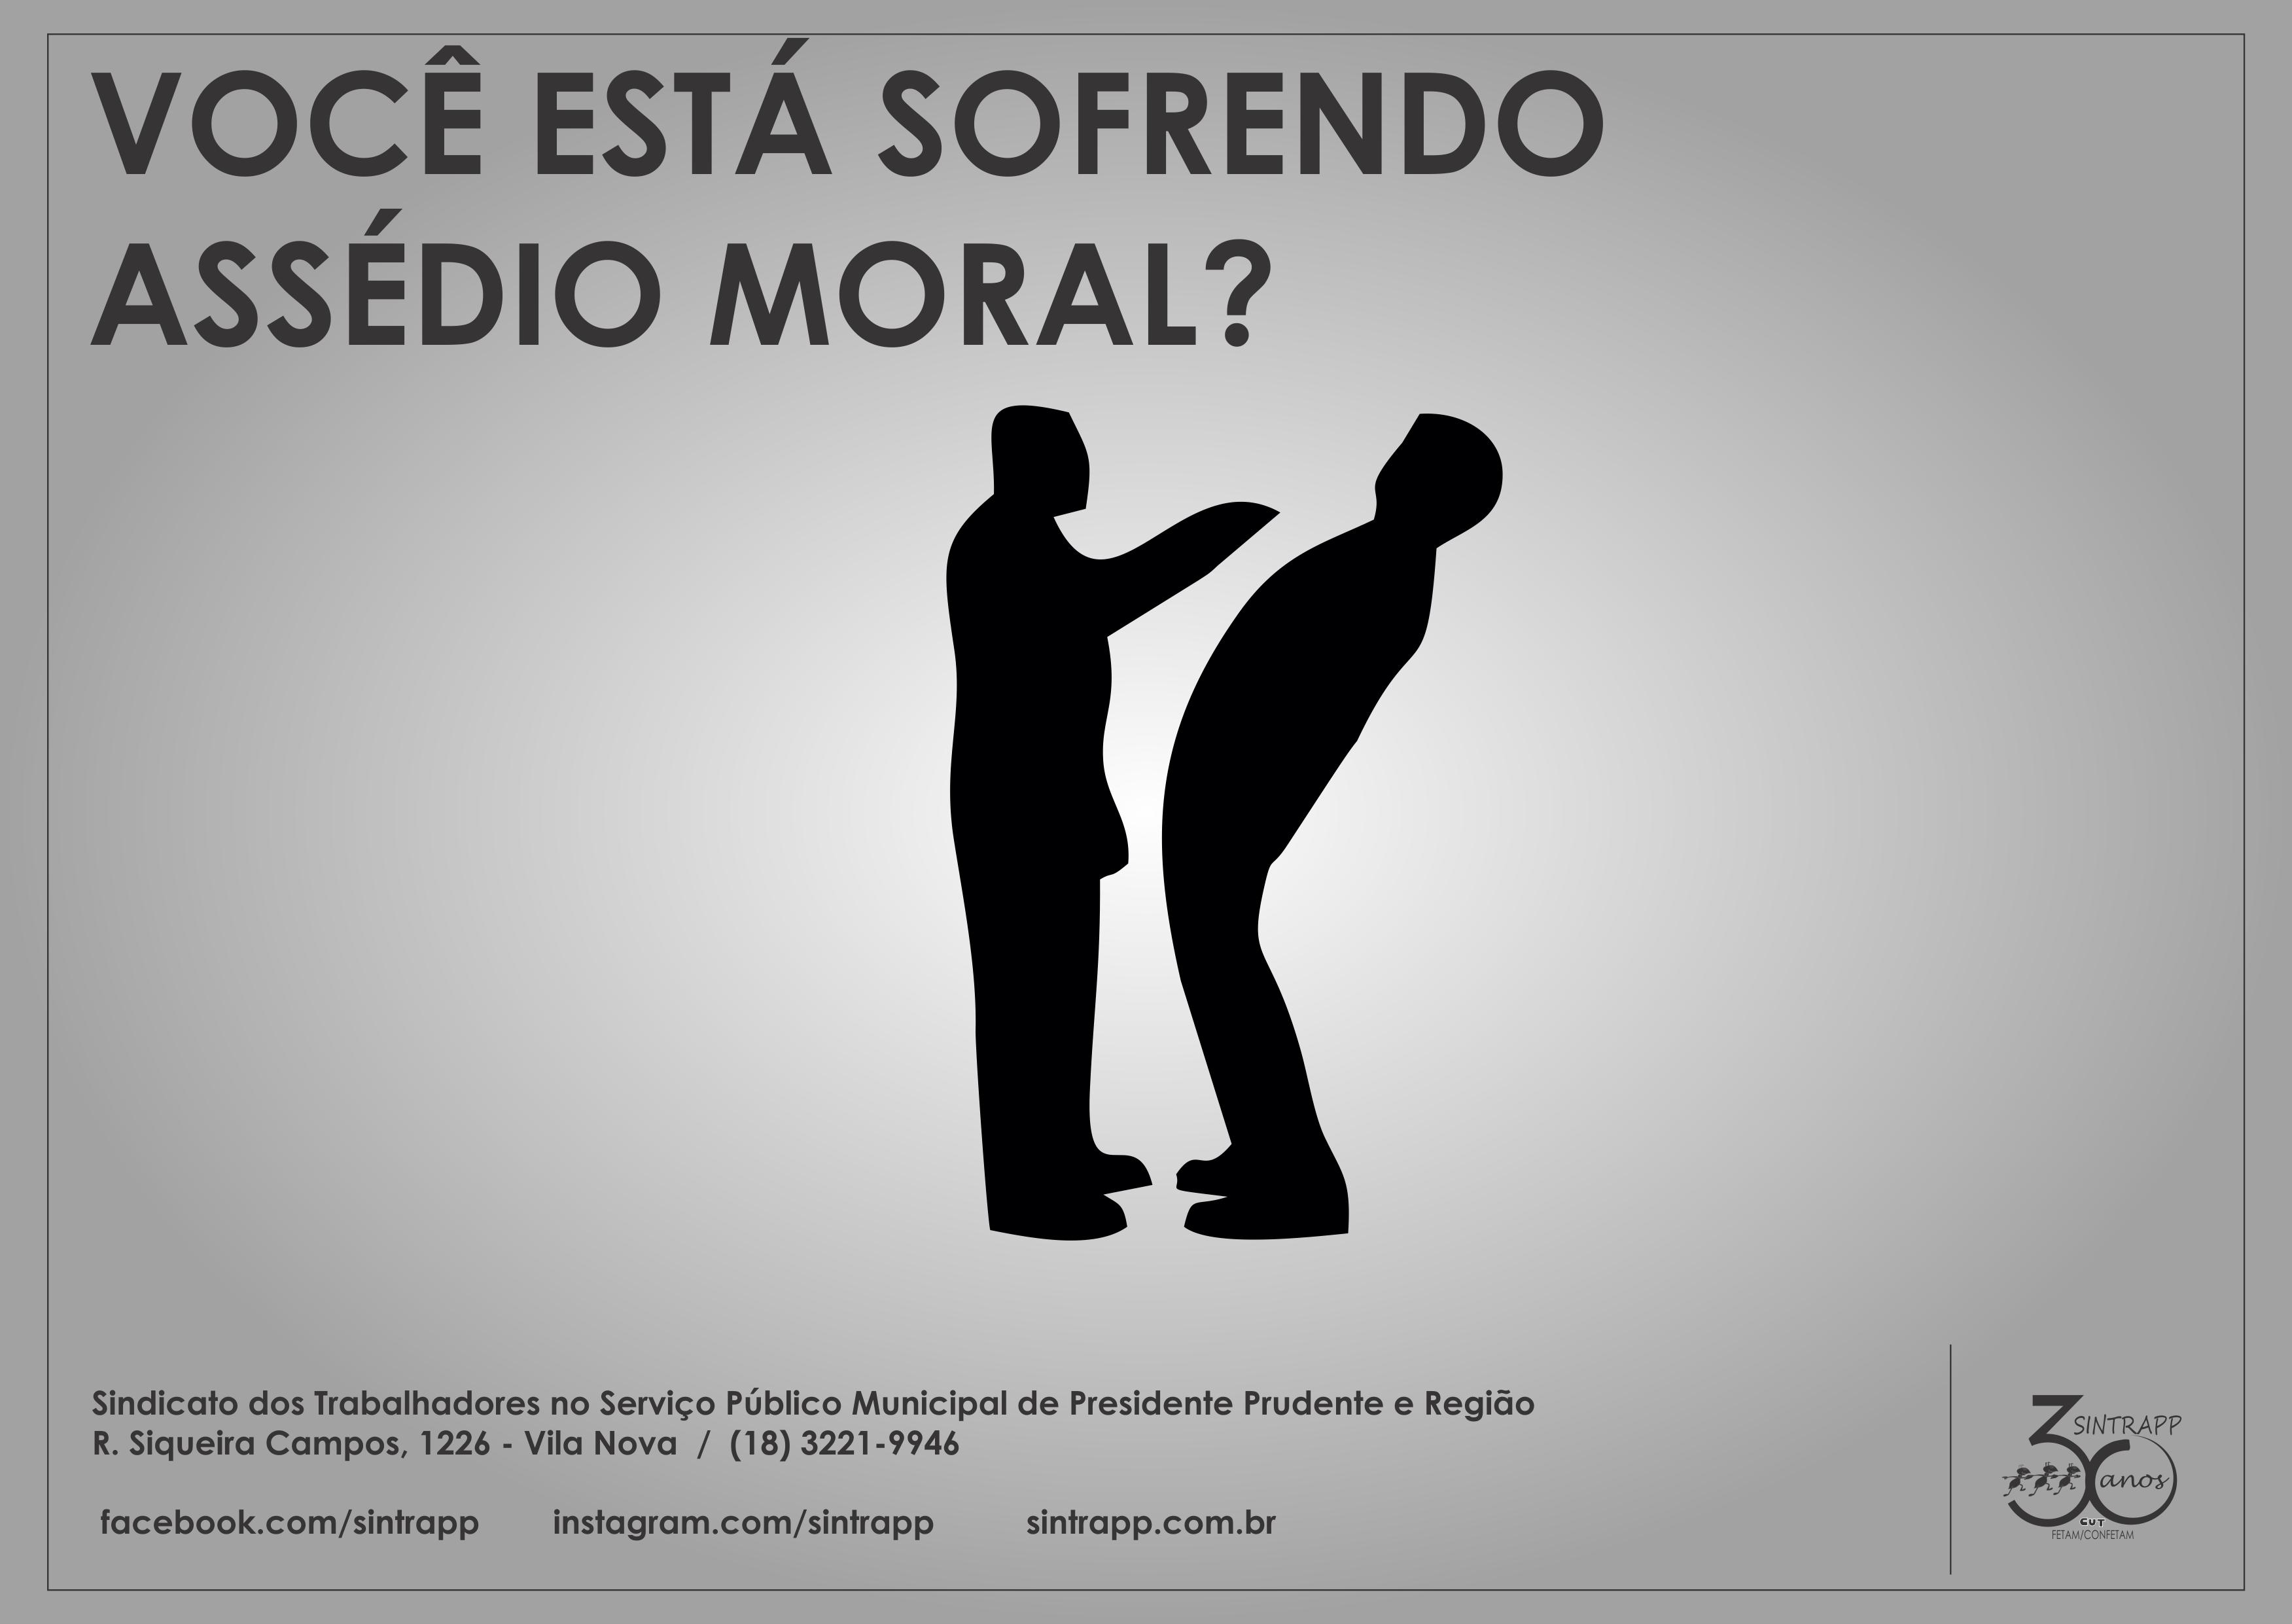 Assédio moral é crime. Denuncie!